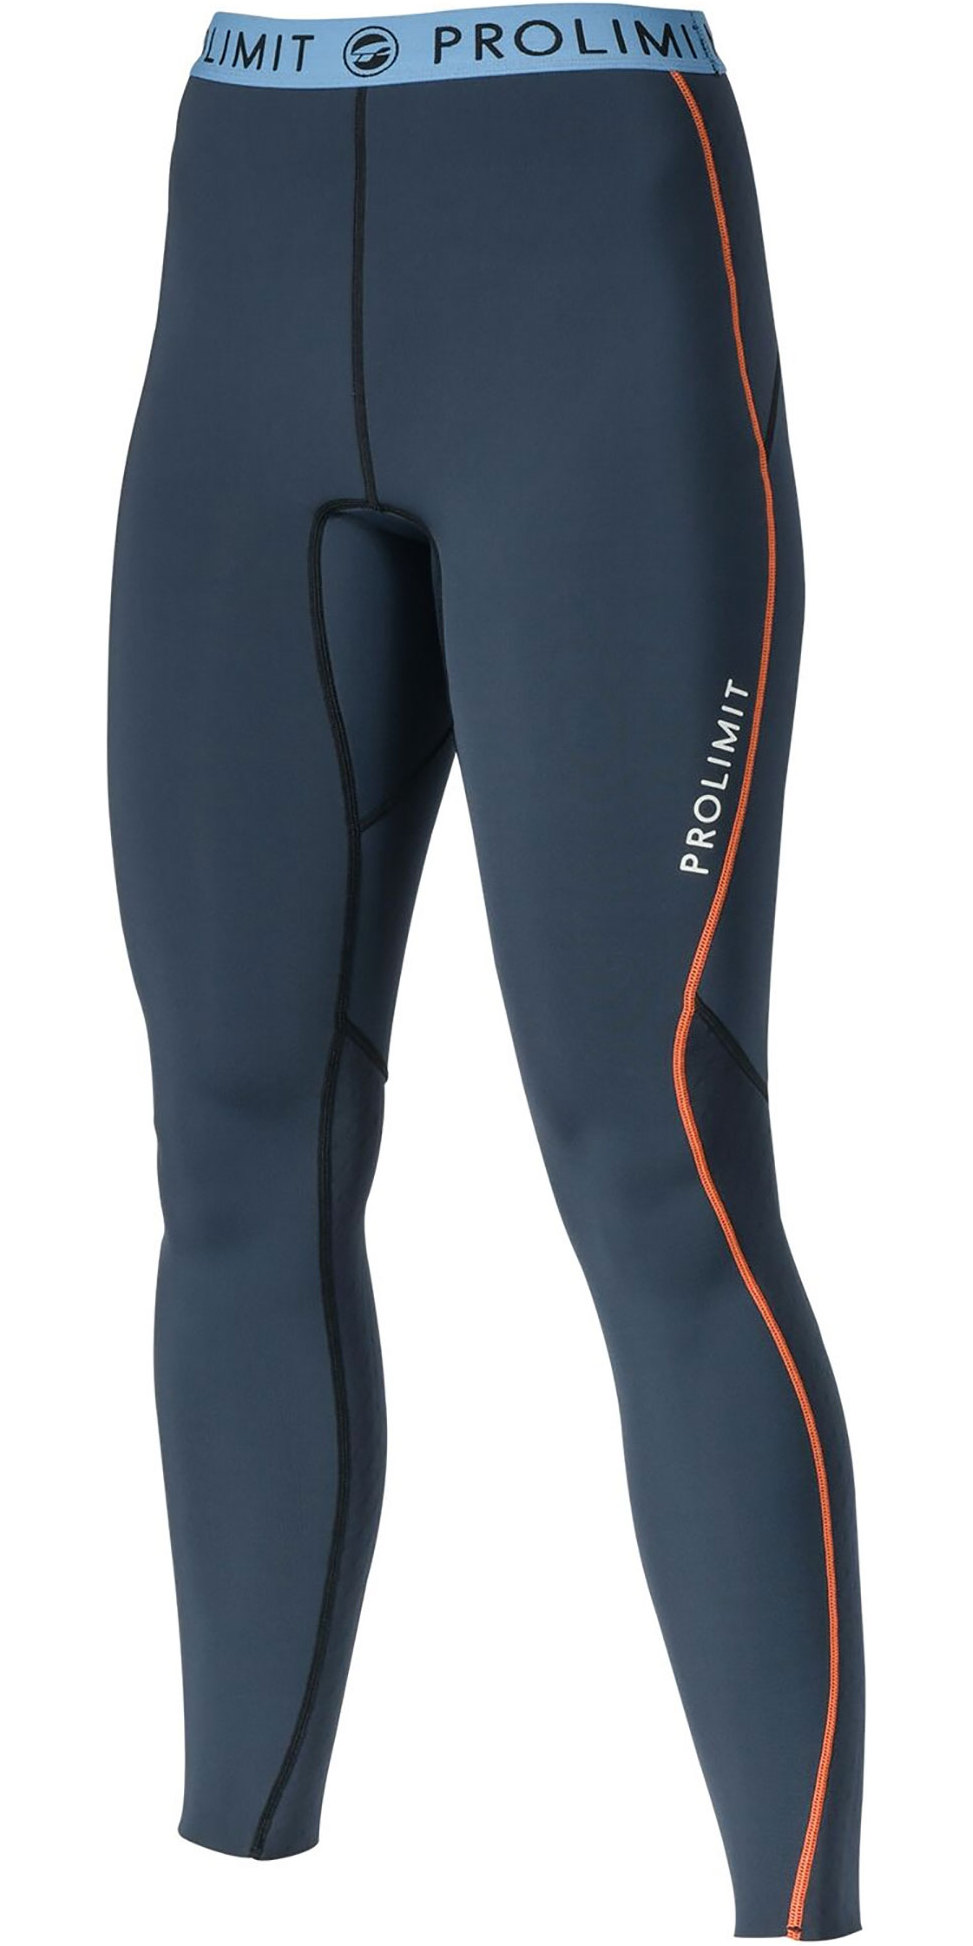 2019 Prolimit Womens 2mm Airmax Neoprene SUP Trousers Slate / Orange 84730  84740